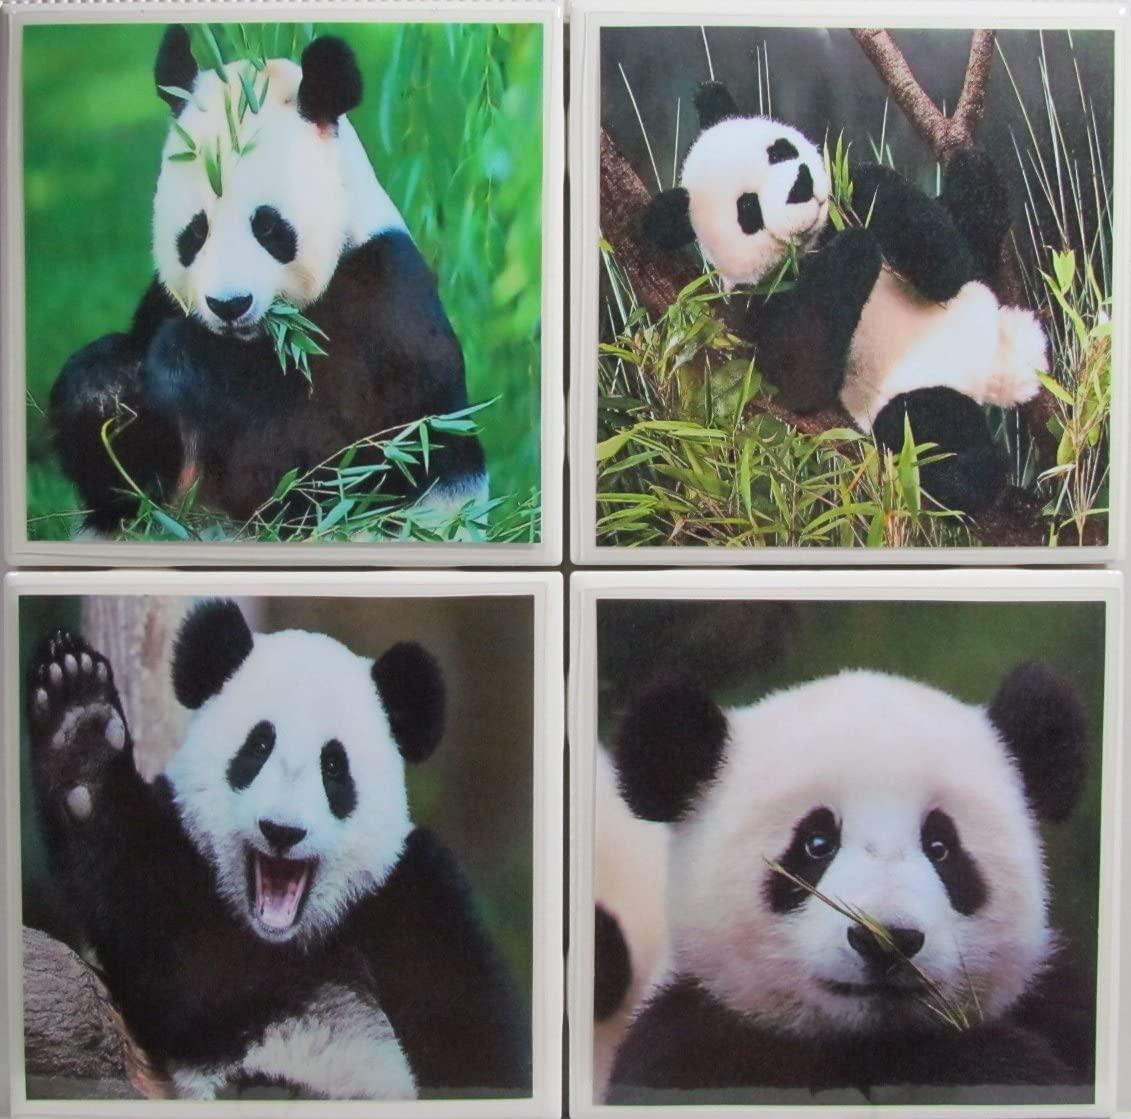 Personalized Coasters - Panda Bears - Set of 4-4